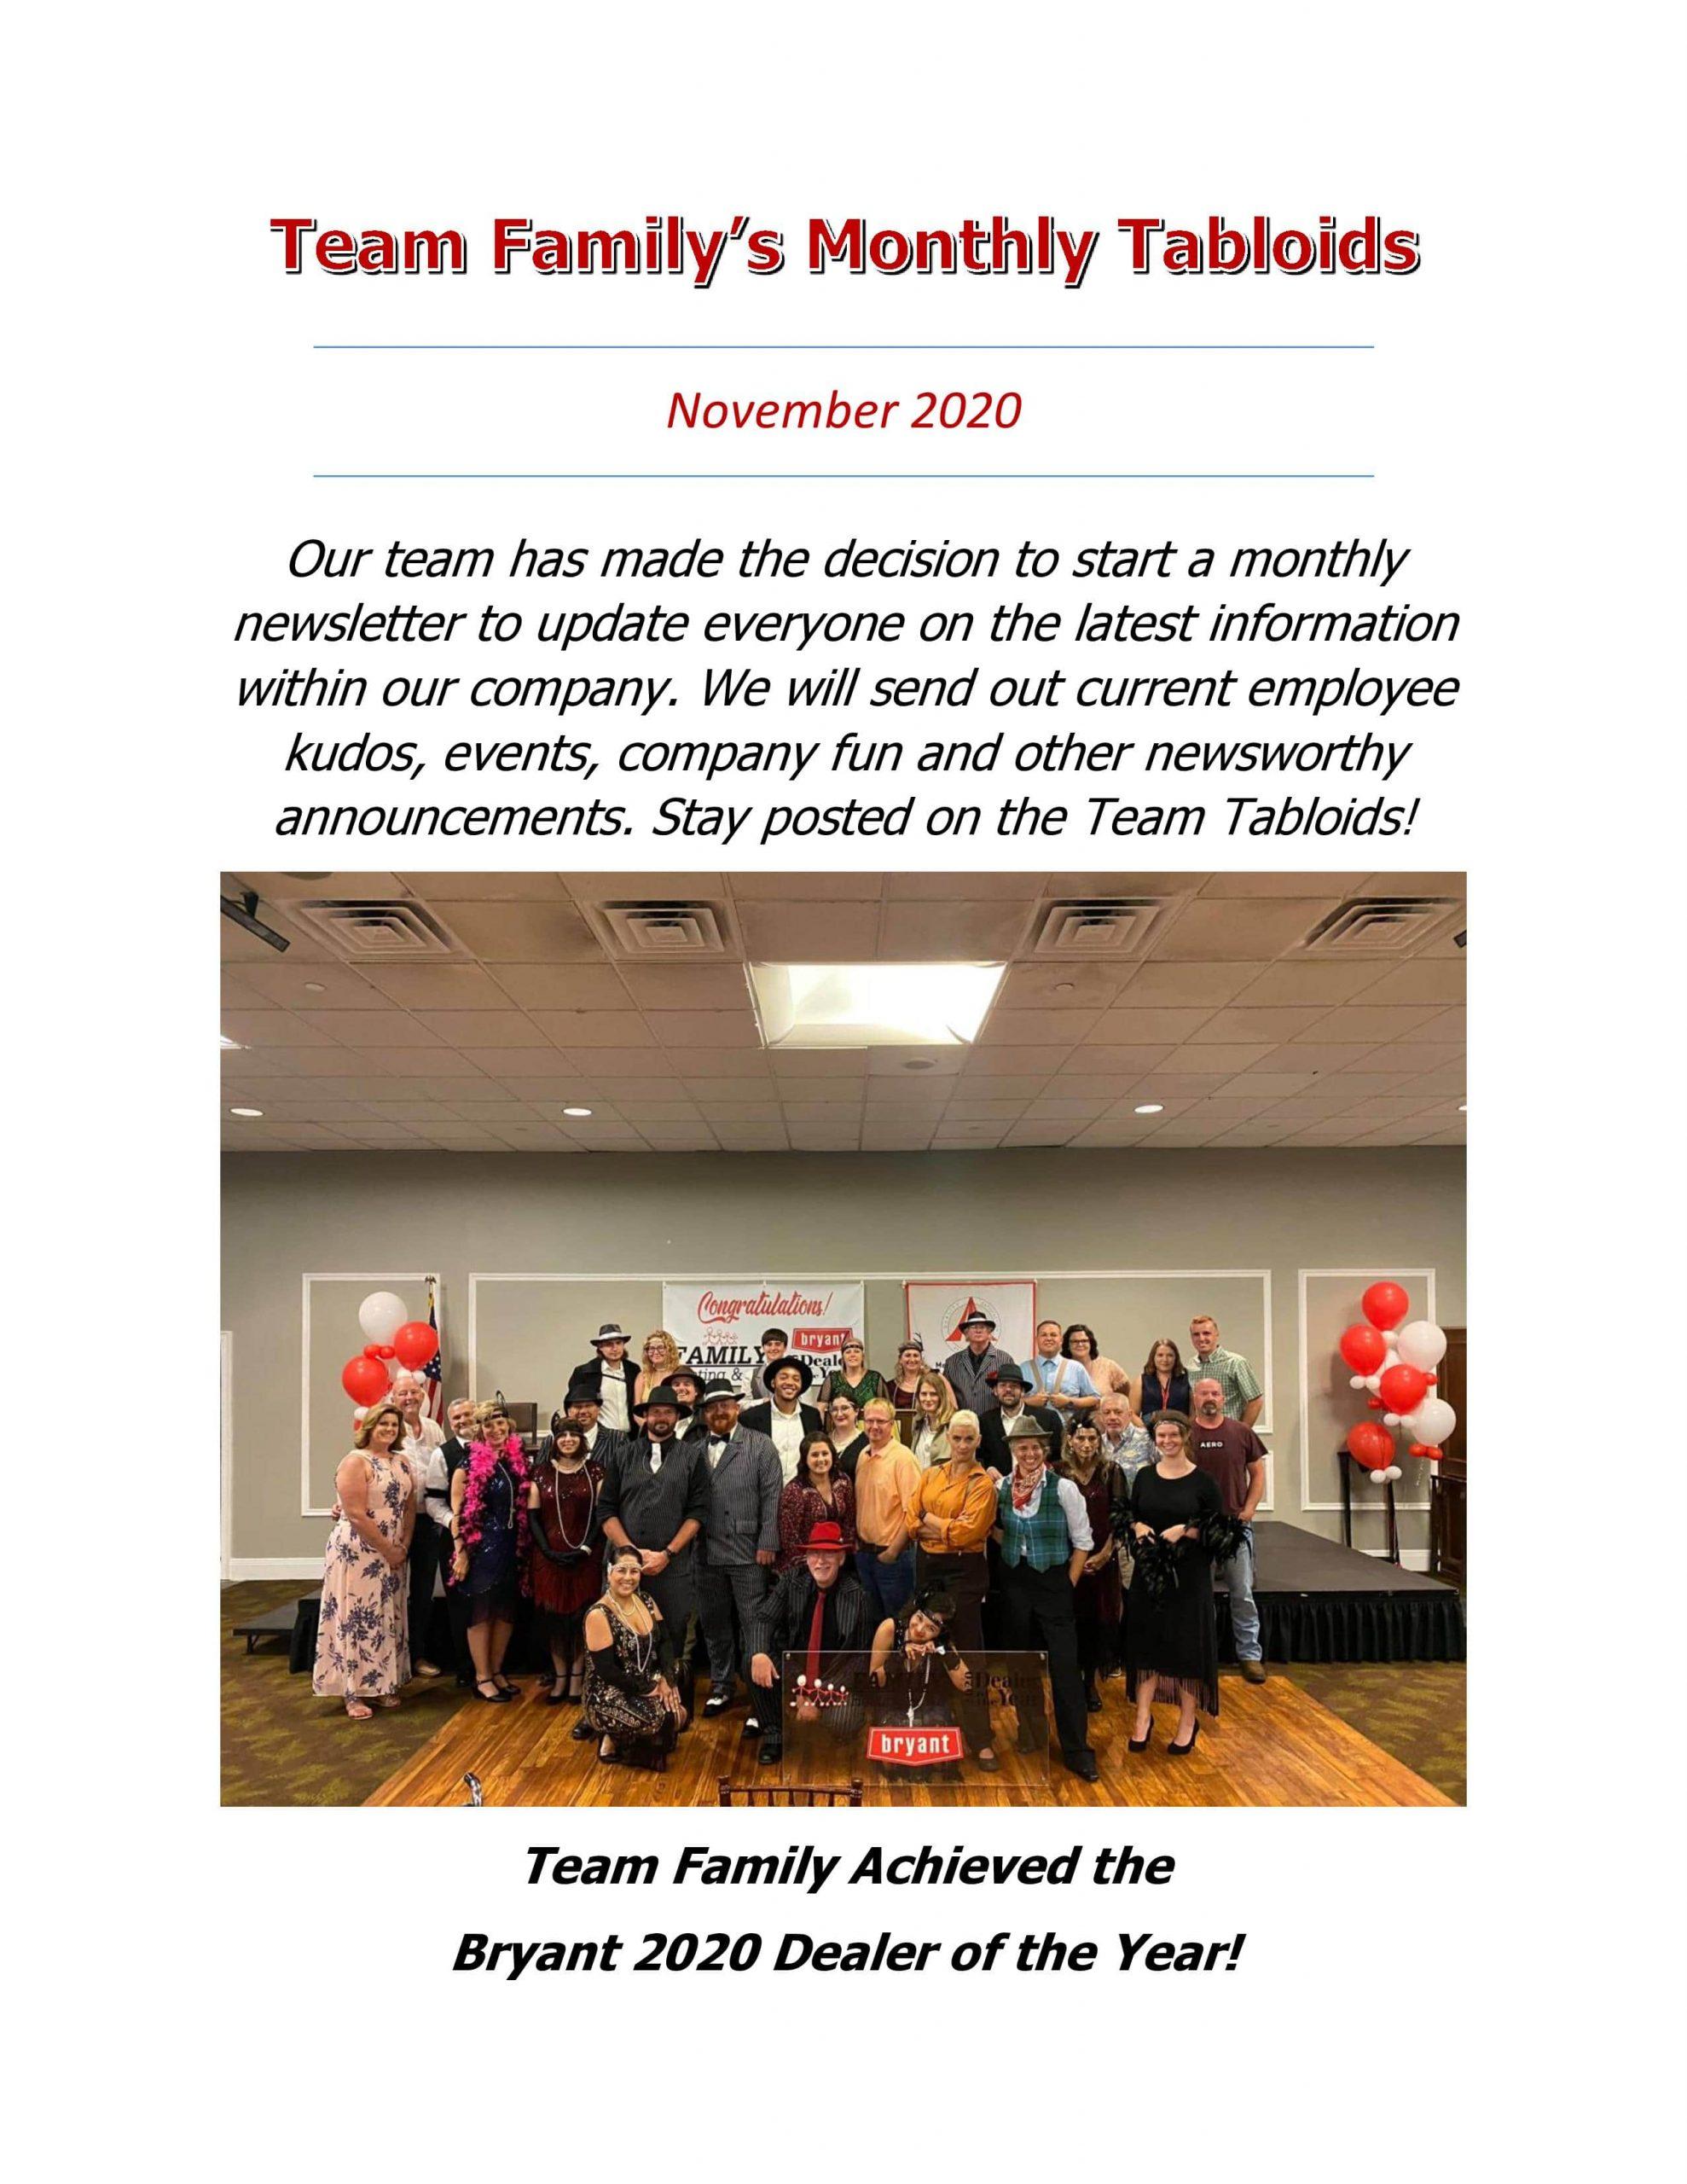 Team Family Monthly Tabloids - November 2020